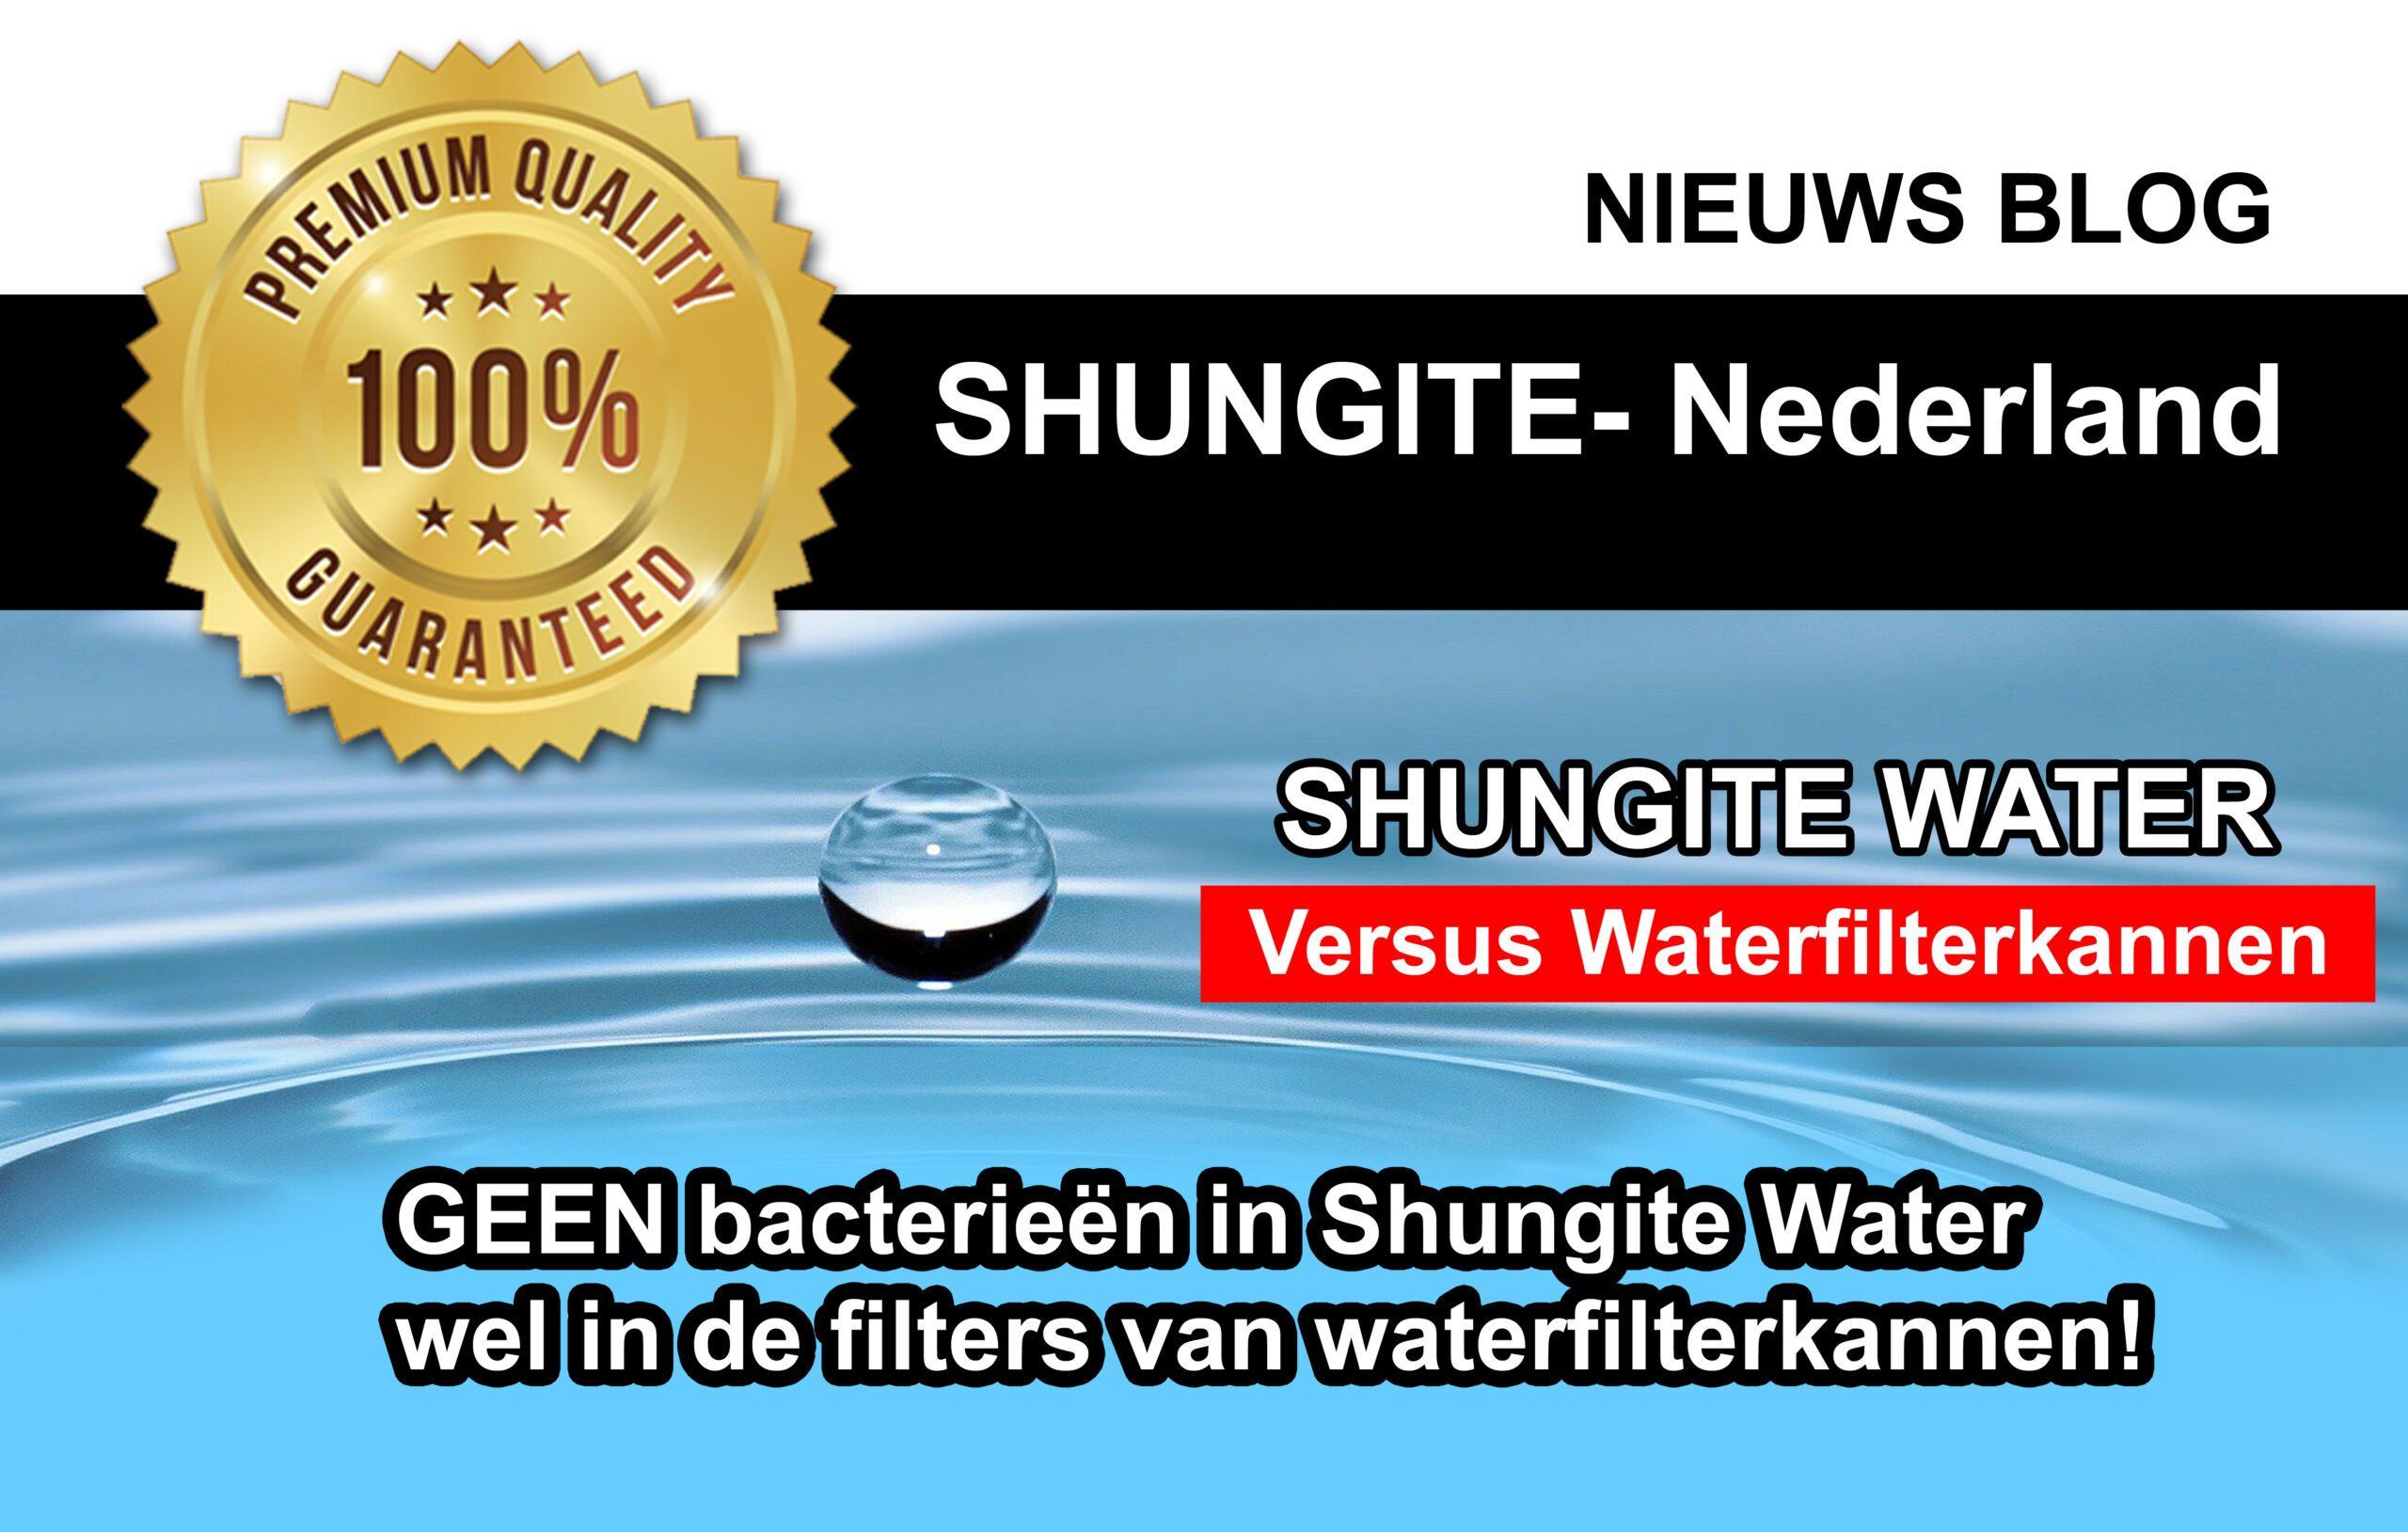 Waterfilterkan VS Shungite water